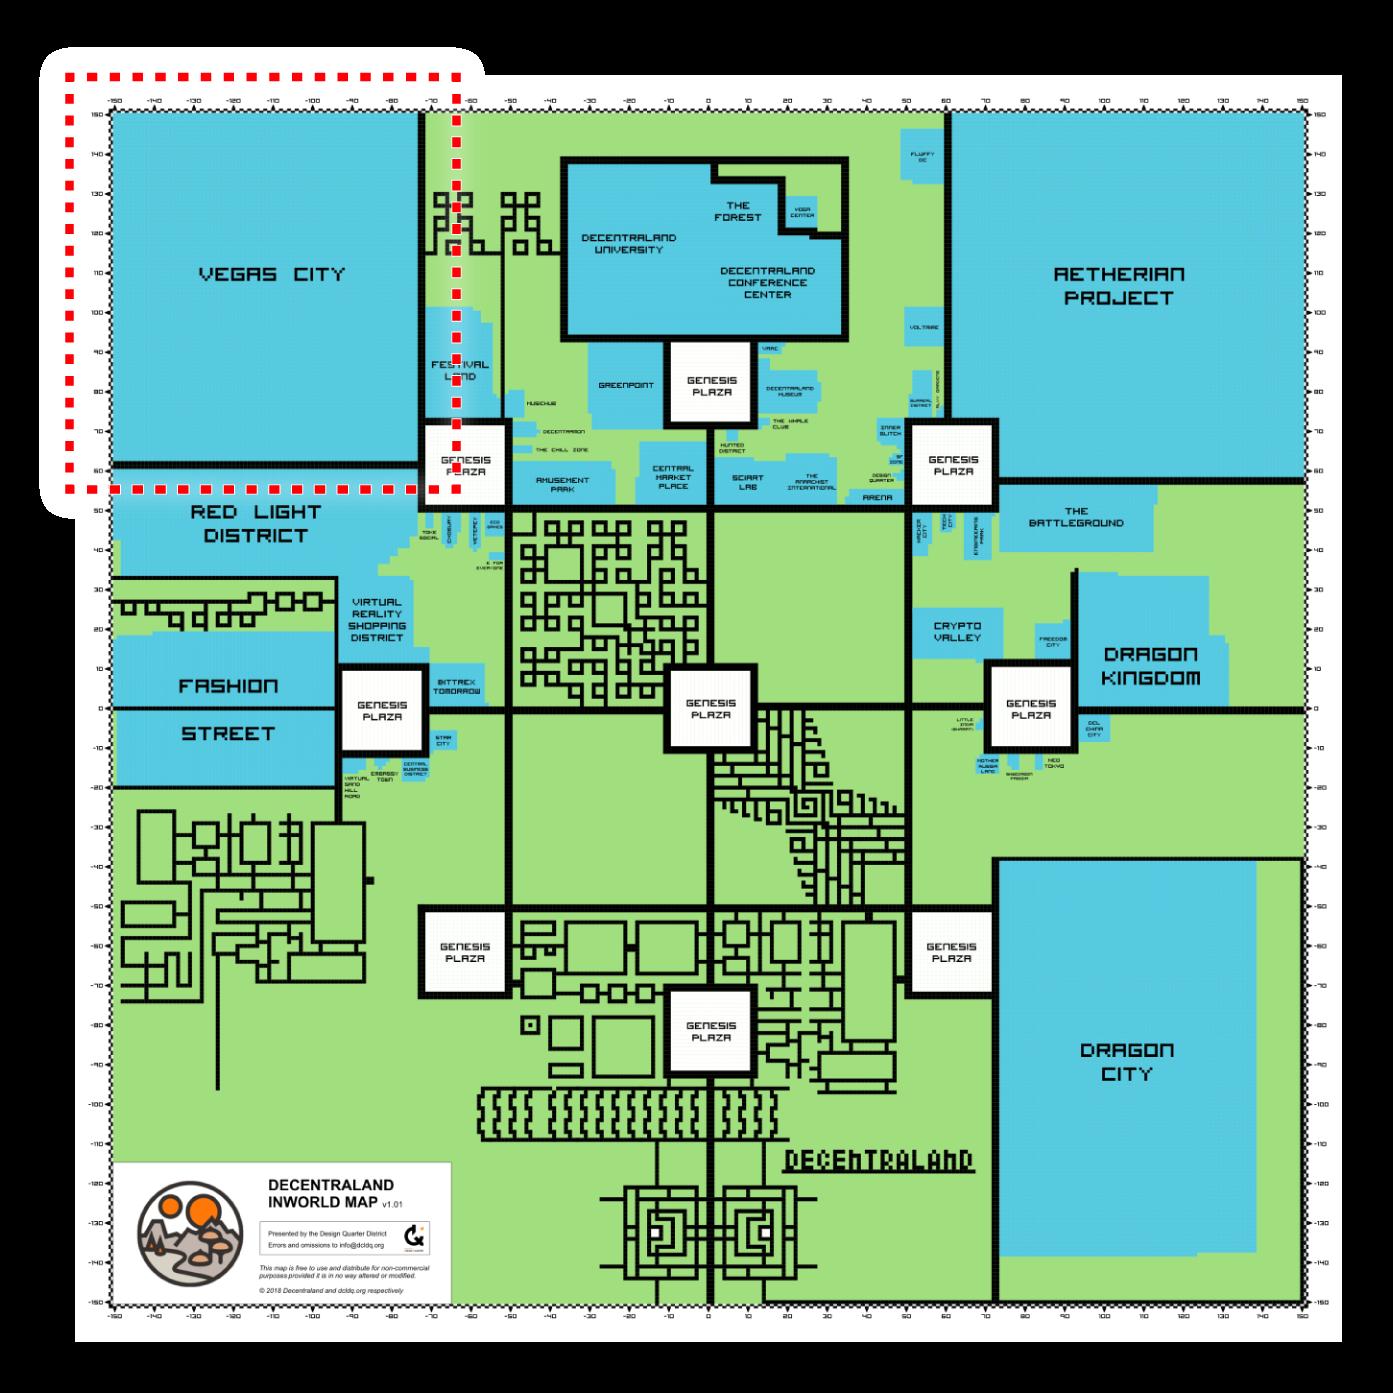 decentraland-map.png